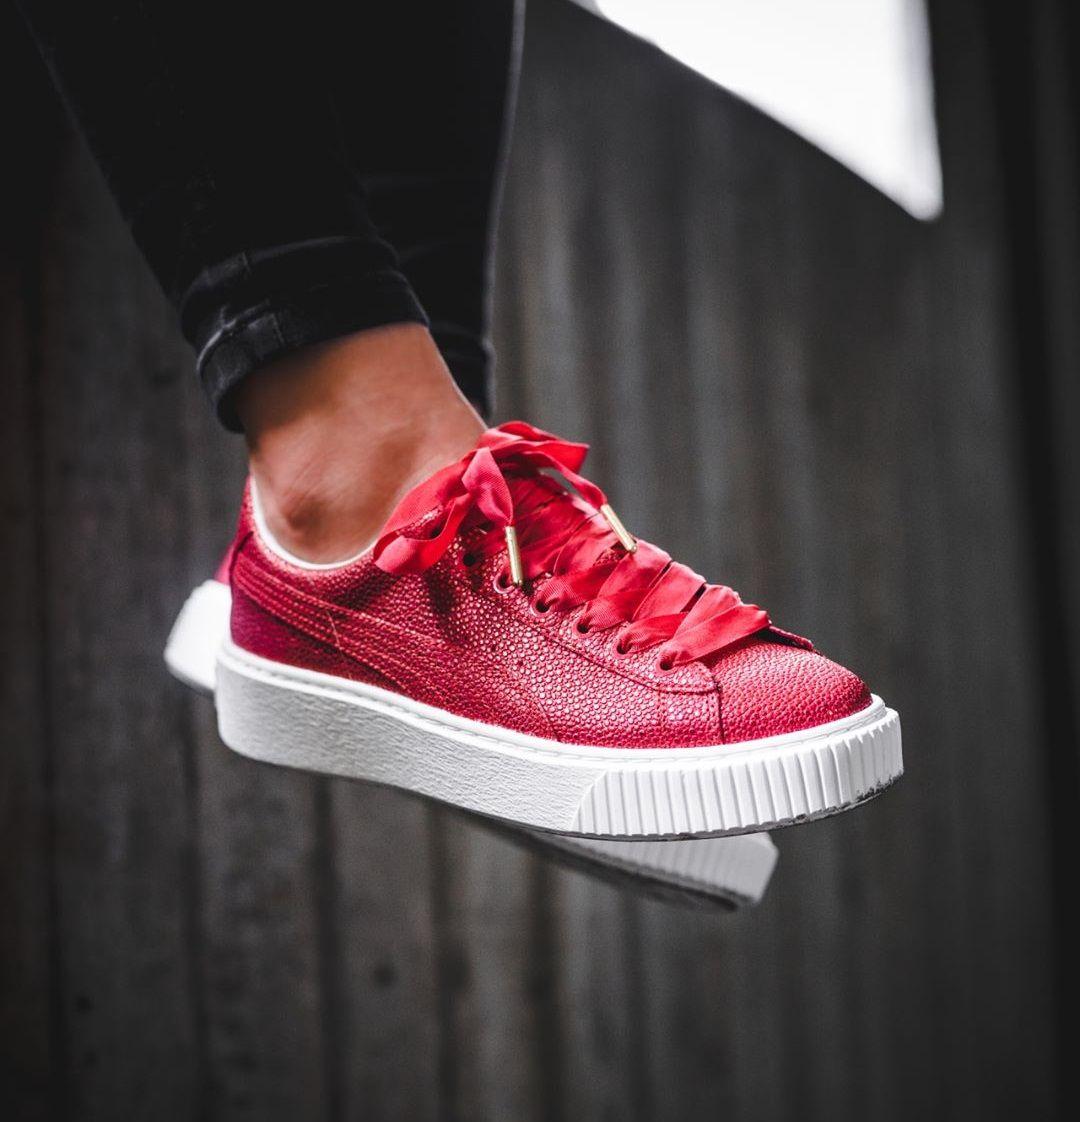 Puma, Platform sneakers, Shoes